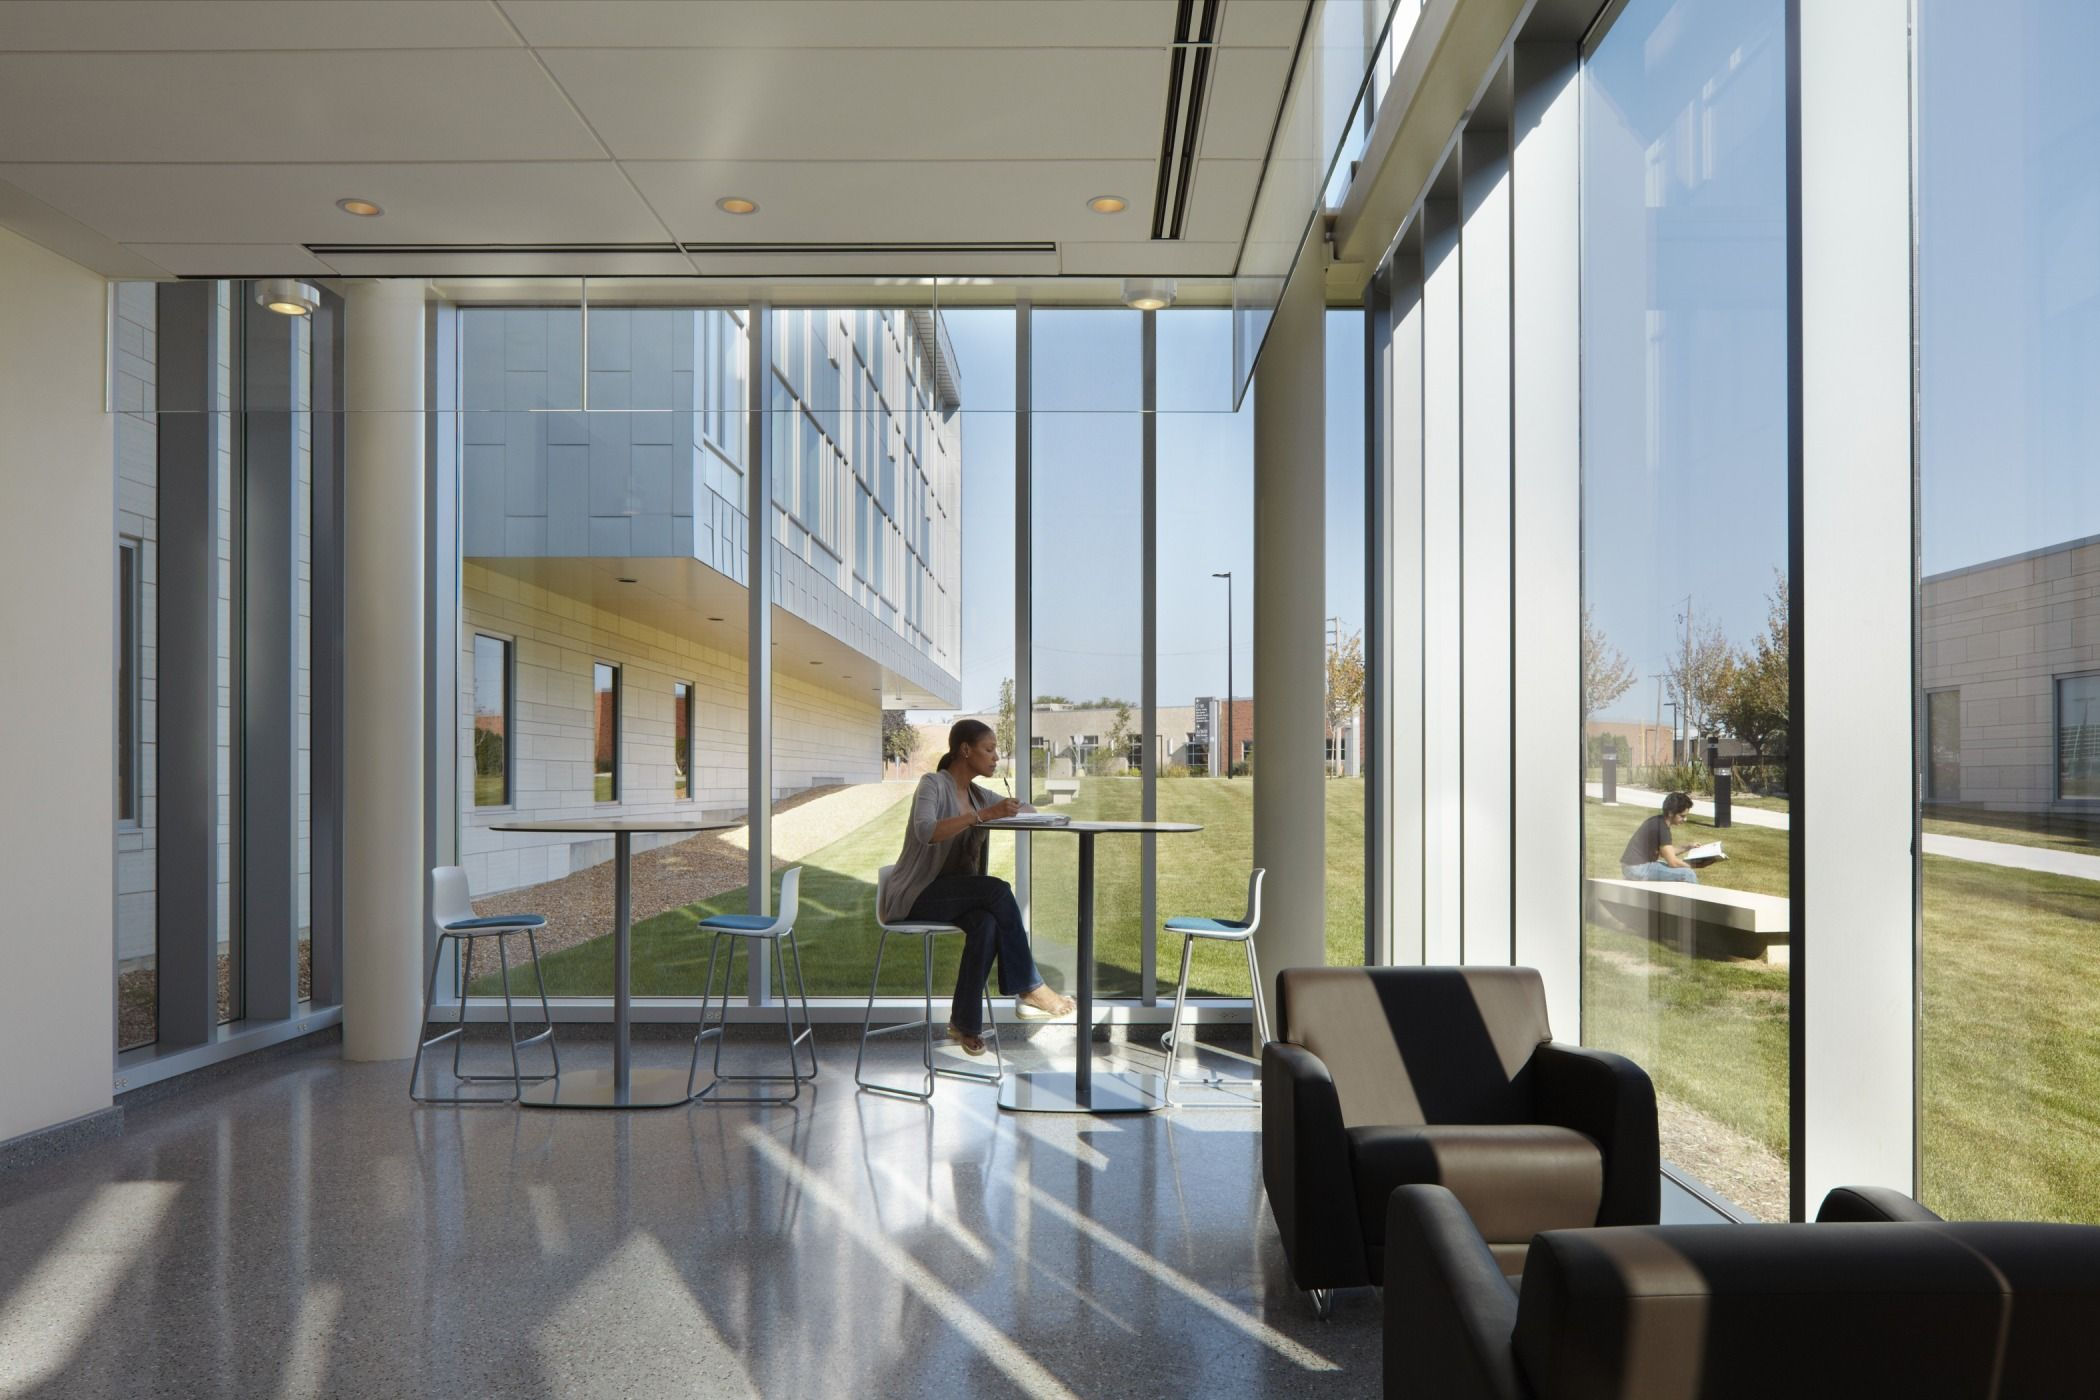 Elgin community college health and life sciences building corridor